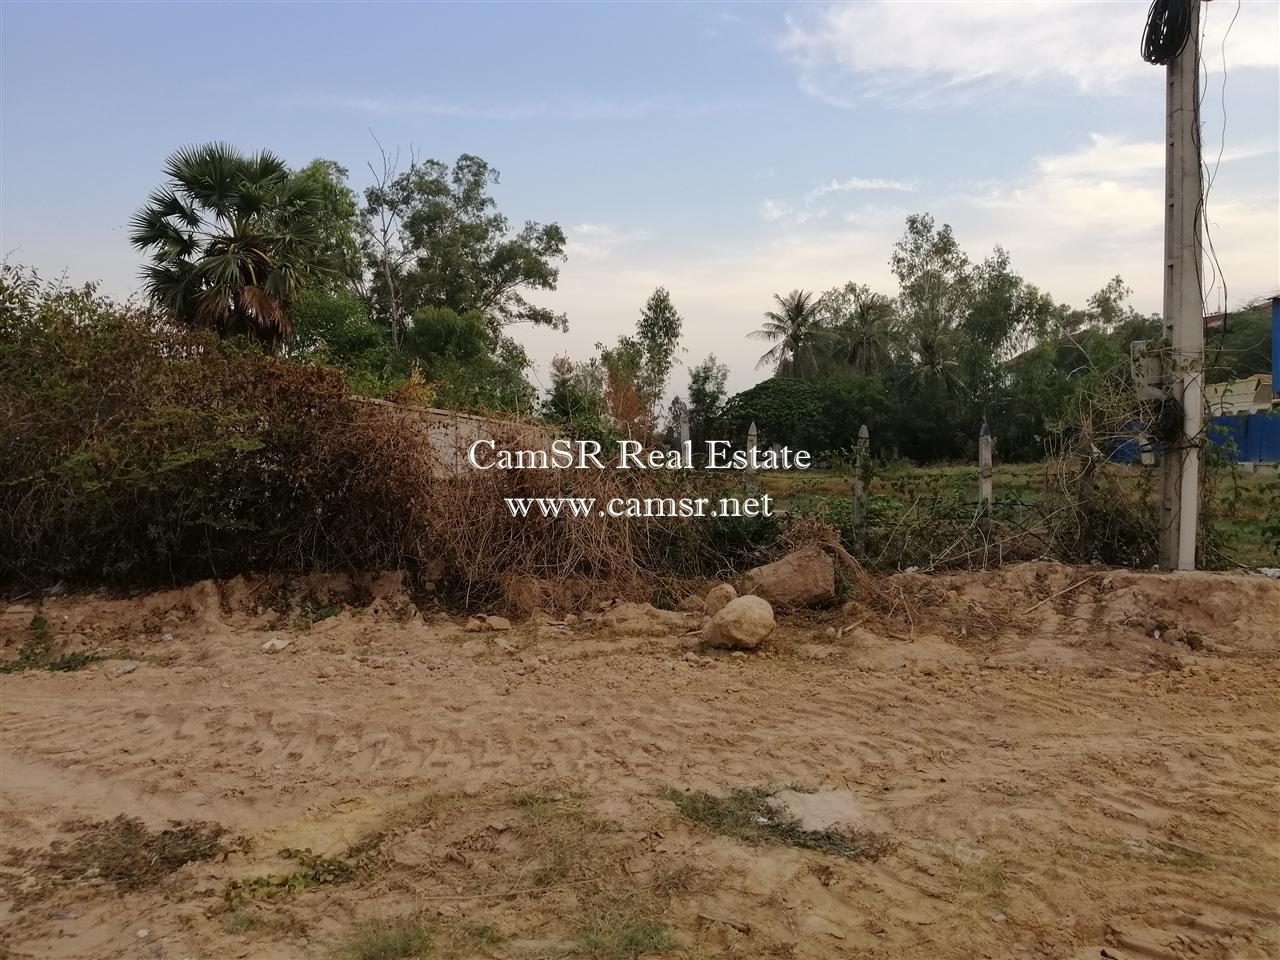 Land for Sale in Siem Reap – Svay Dangkum